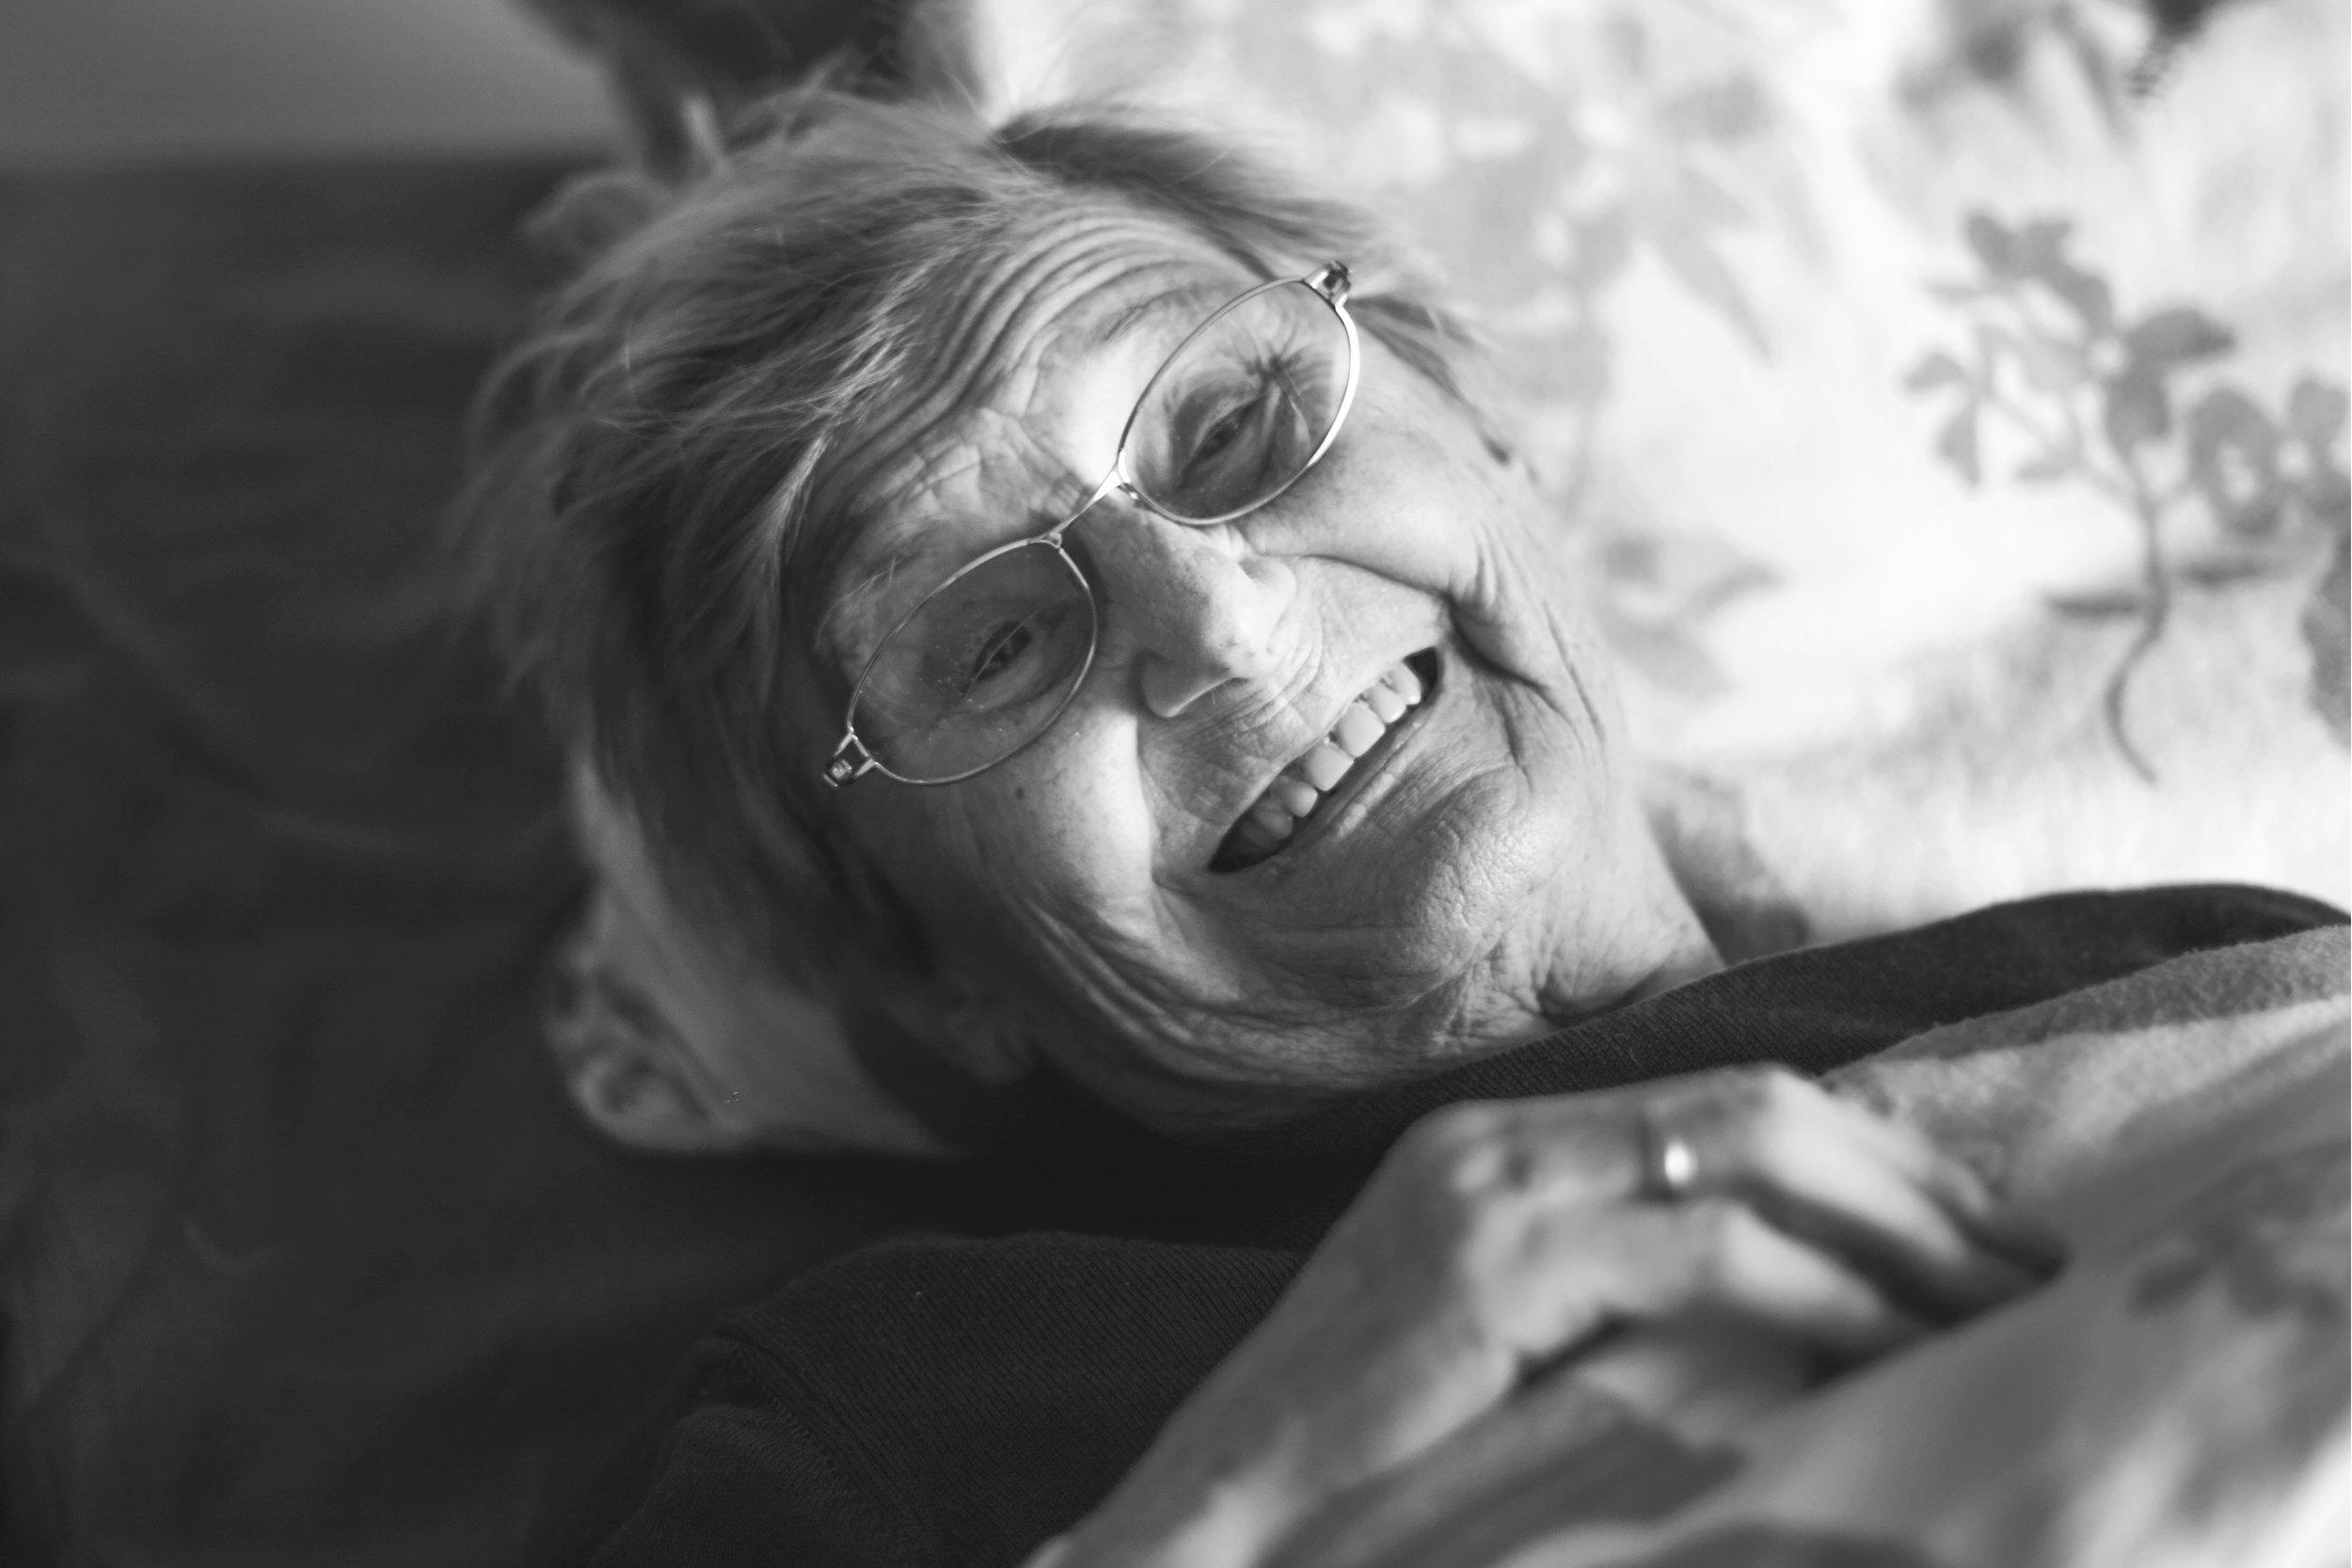 Photographer: Sissela Johansson  My grandmother - the last smile I captured before she passed